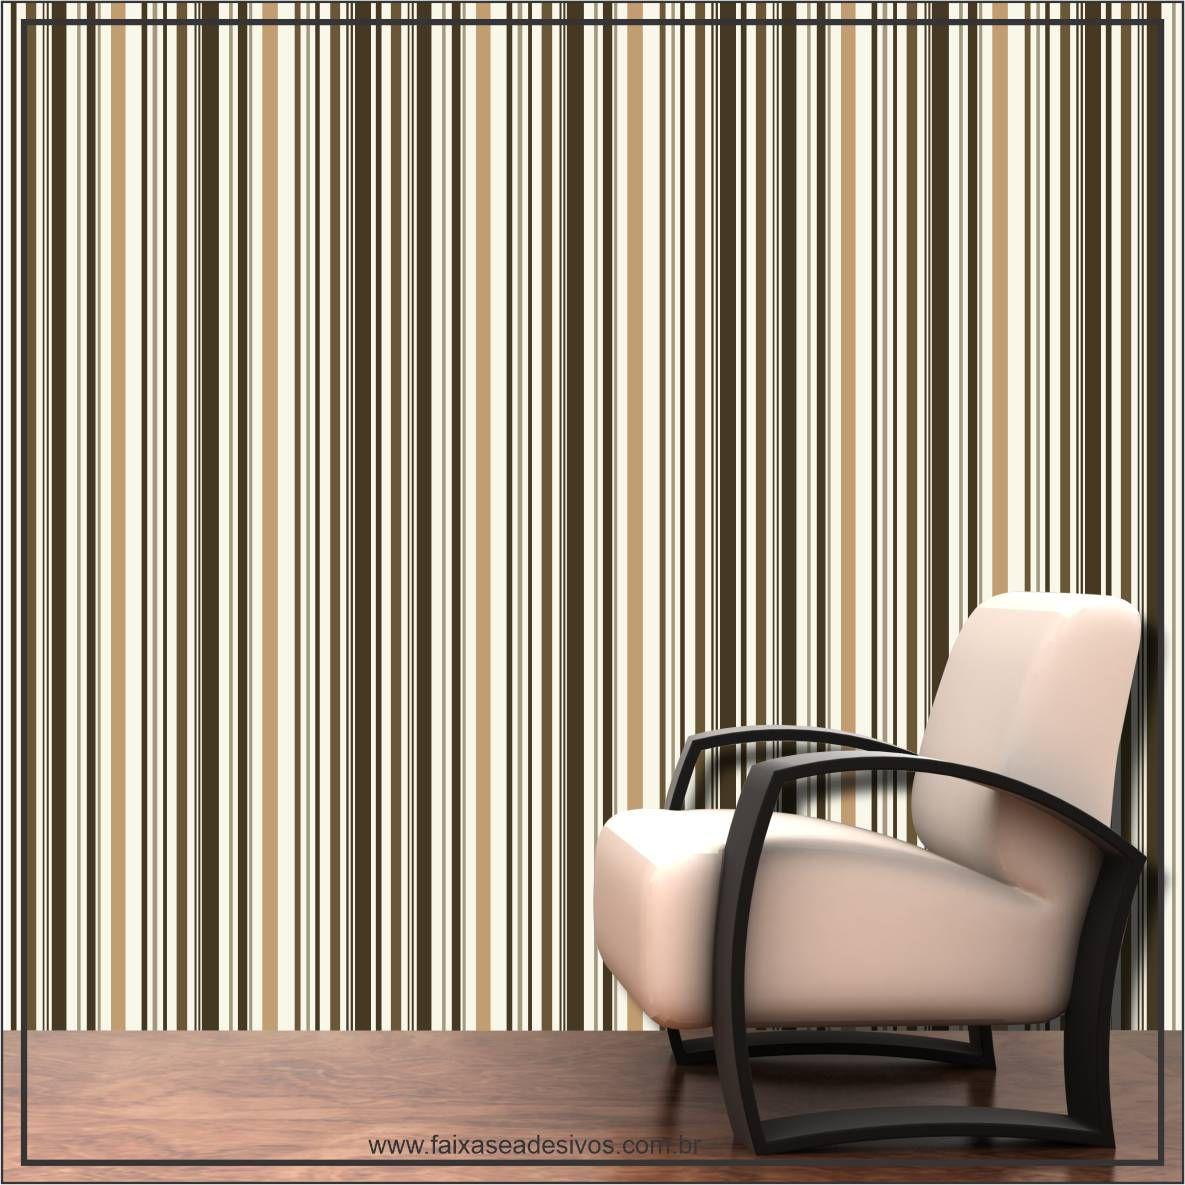 018 - Adesivo Decorativo de parede Listras ocre - 58cm larg  - Fac Signs